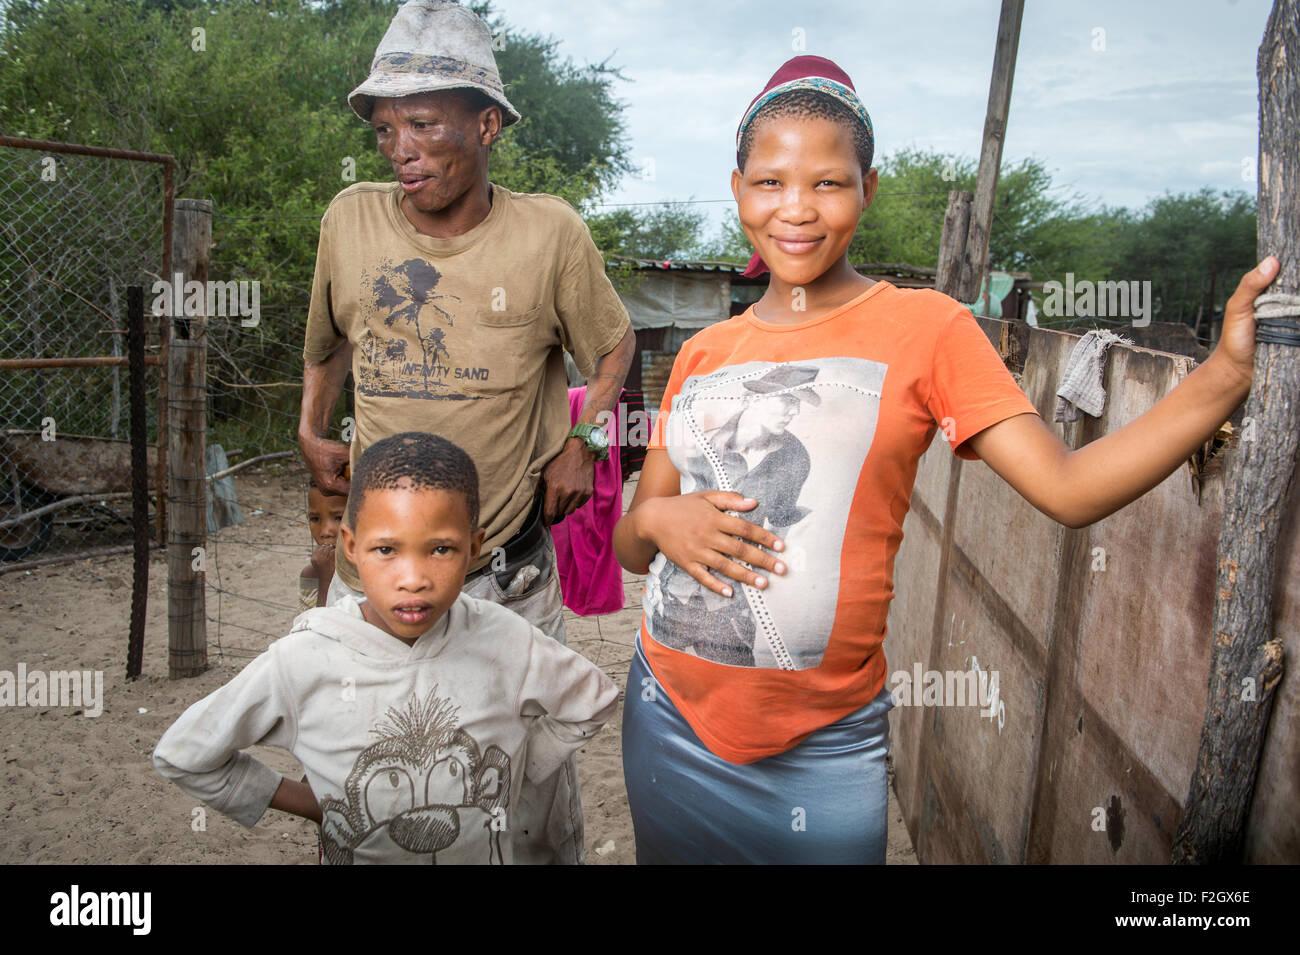 San people, or bushmen posing for a photo in Botswana, Africa - Stock Image